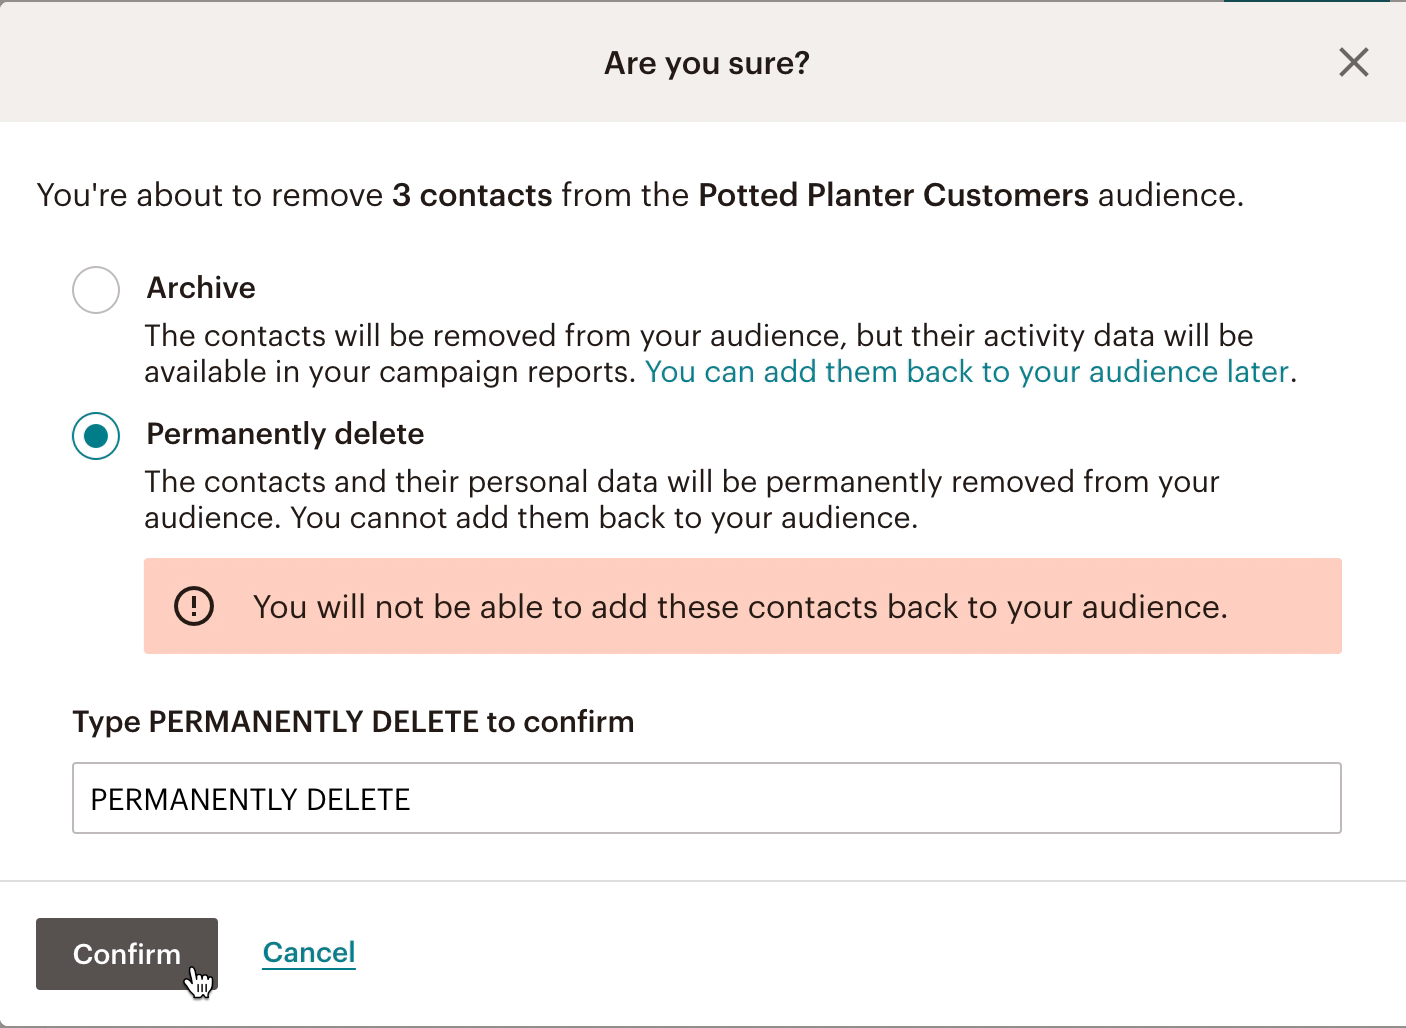 Suppression des contacts-Permanently delete (Supprimer définitivement)-confirm (confirmer)